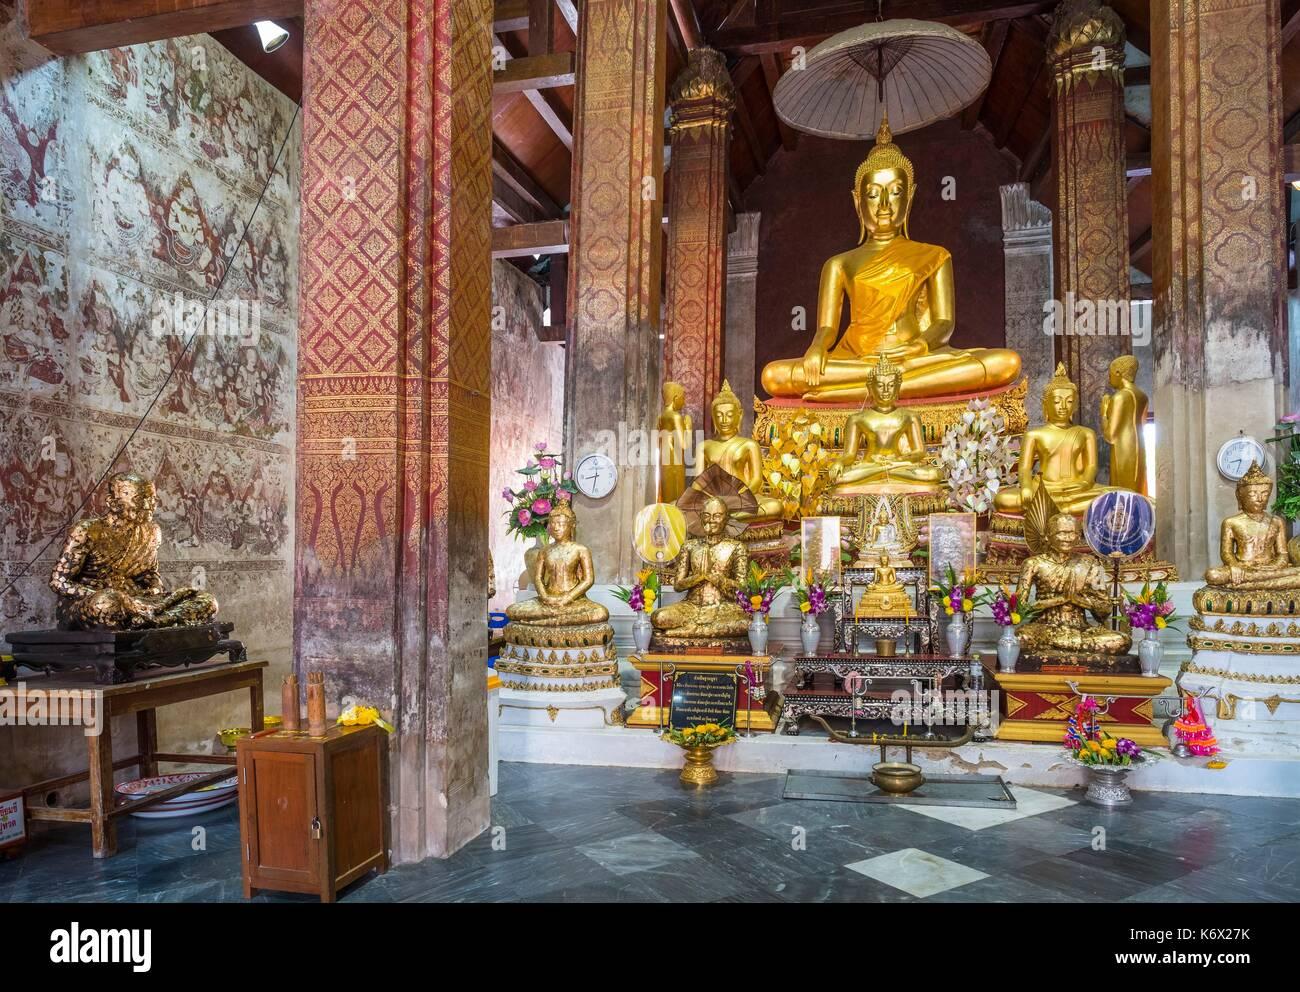 Thailand, Phetchaburi province, Phetchaburi, 17th century Wat Yai Suwannaram temple Stock Photo